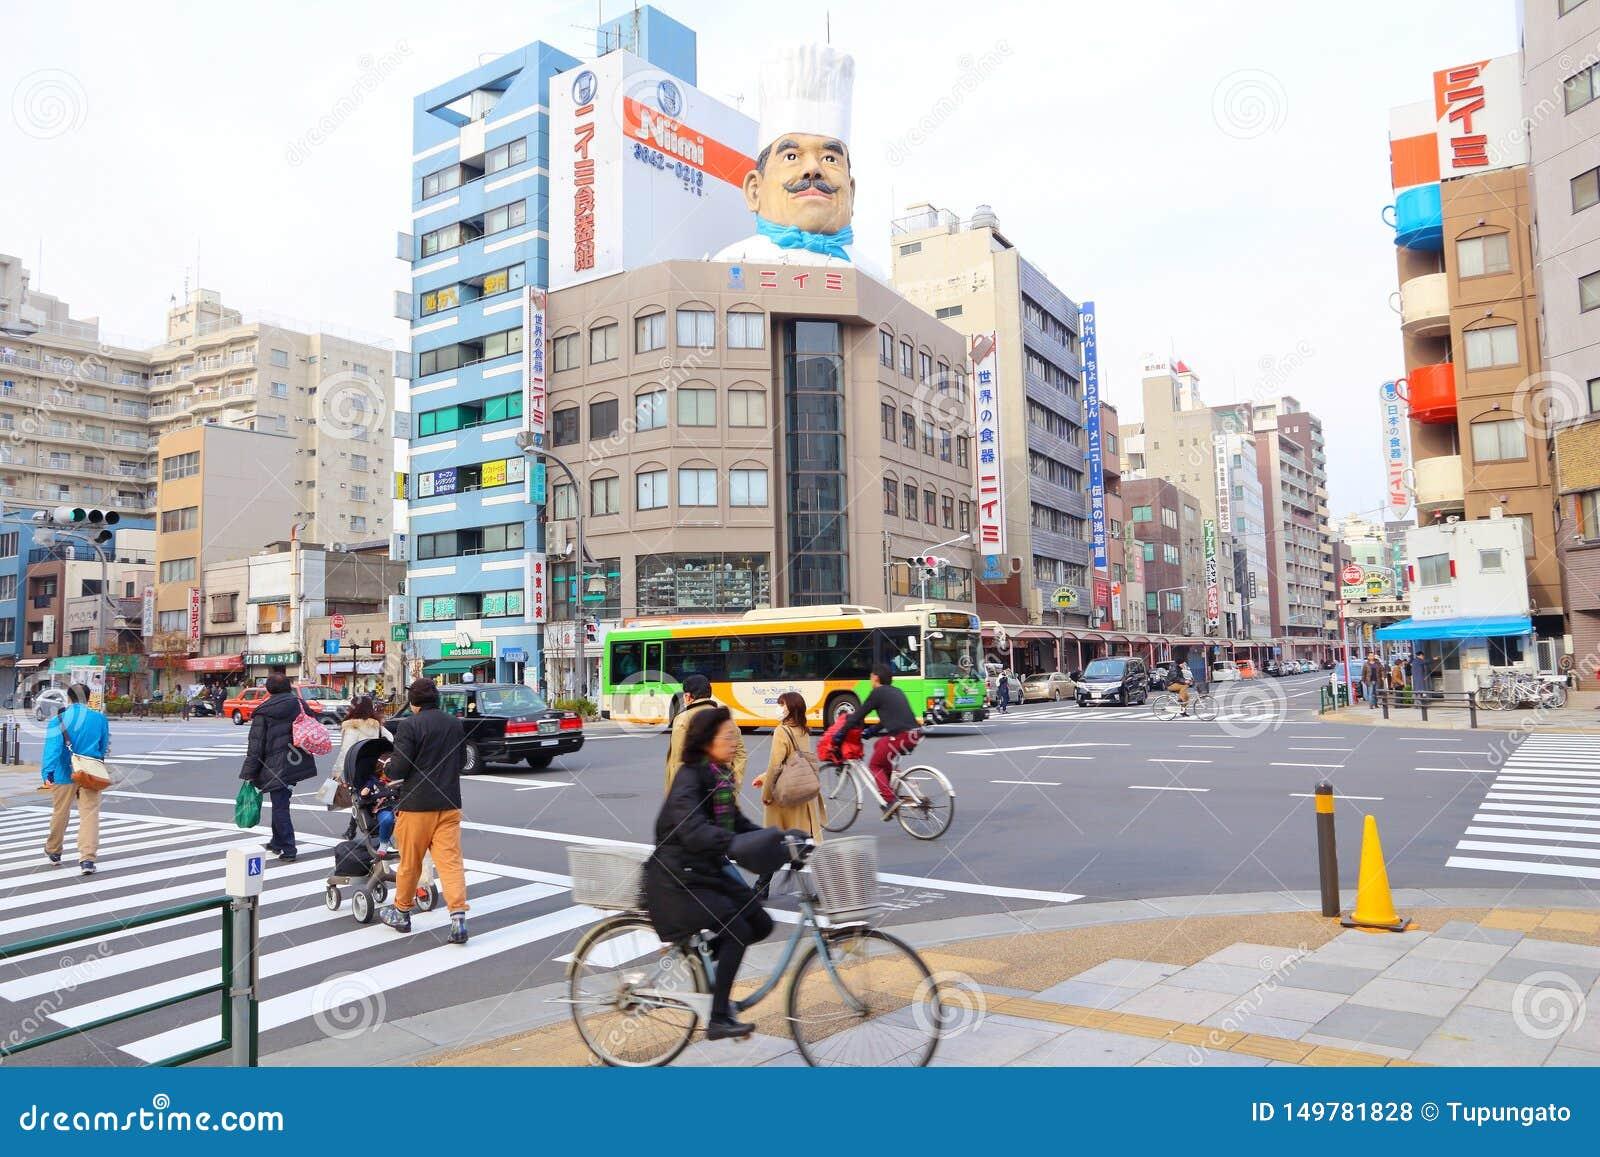 Asakusa - Kappabashi Street